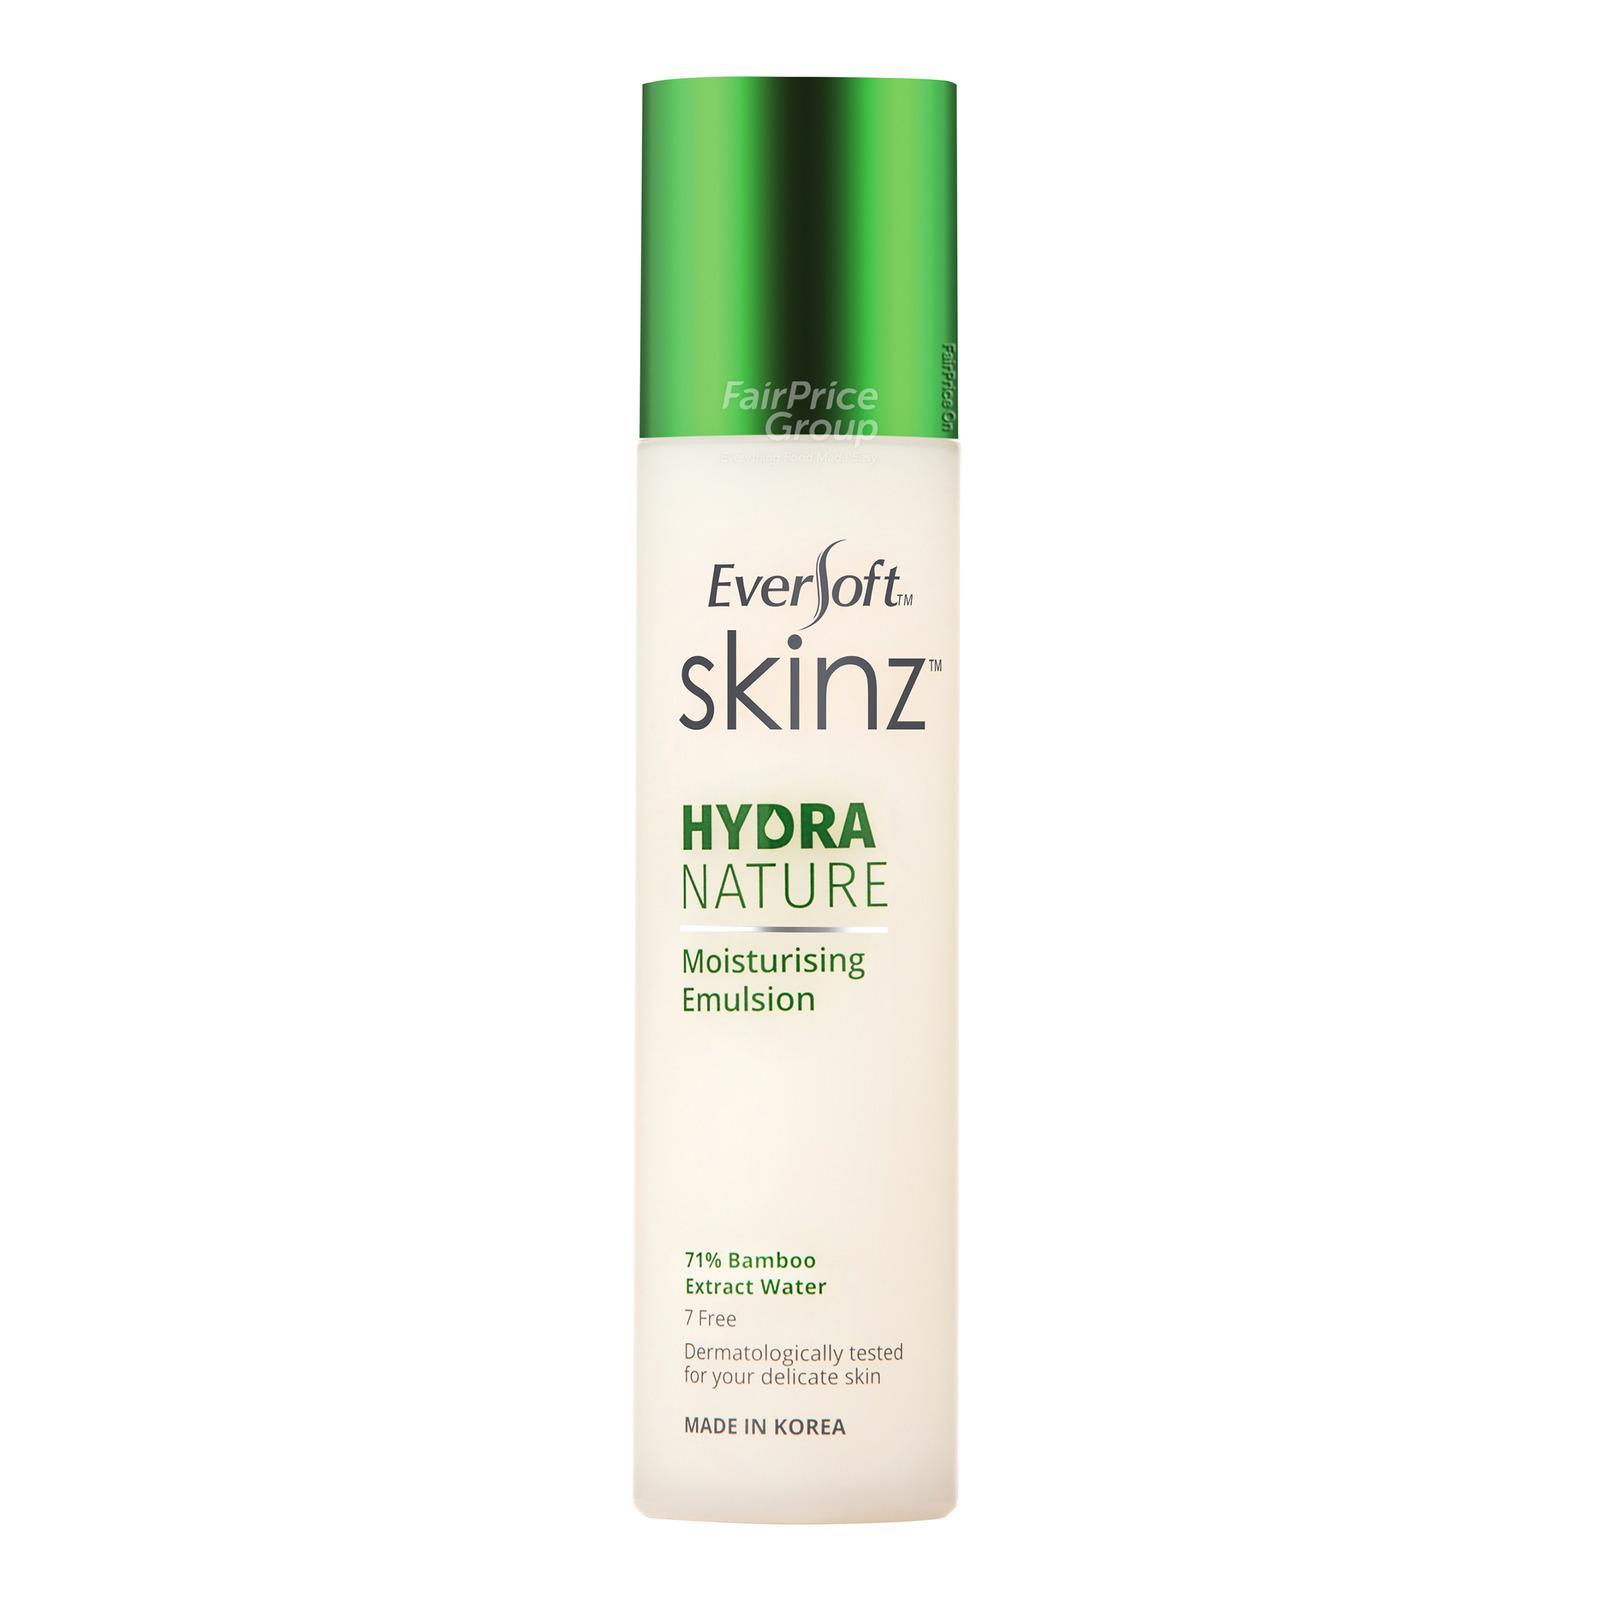 Eversoft Skinz Hydra Nature Moisturising Emulsion